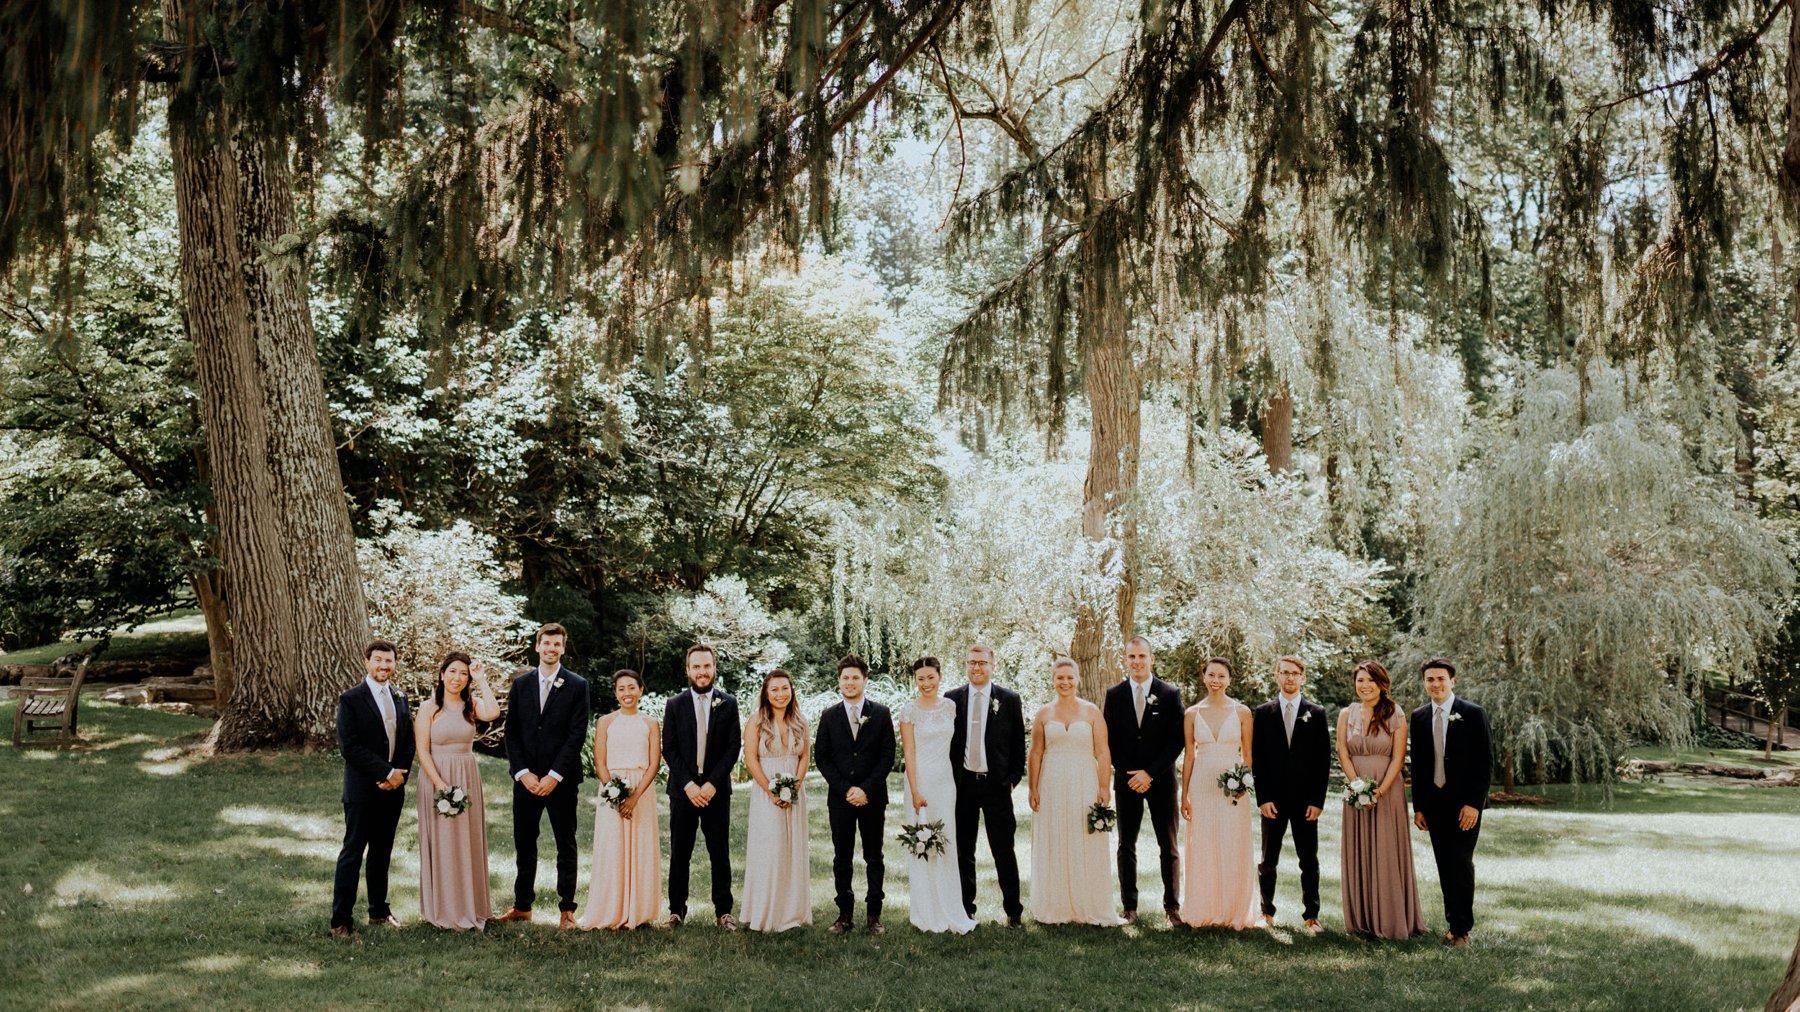 010-006-appleford-estate-wedding-14.jpg